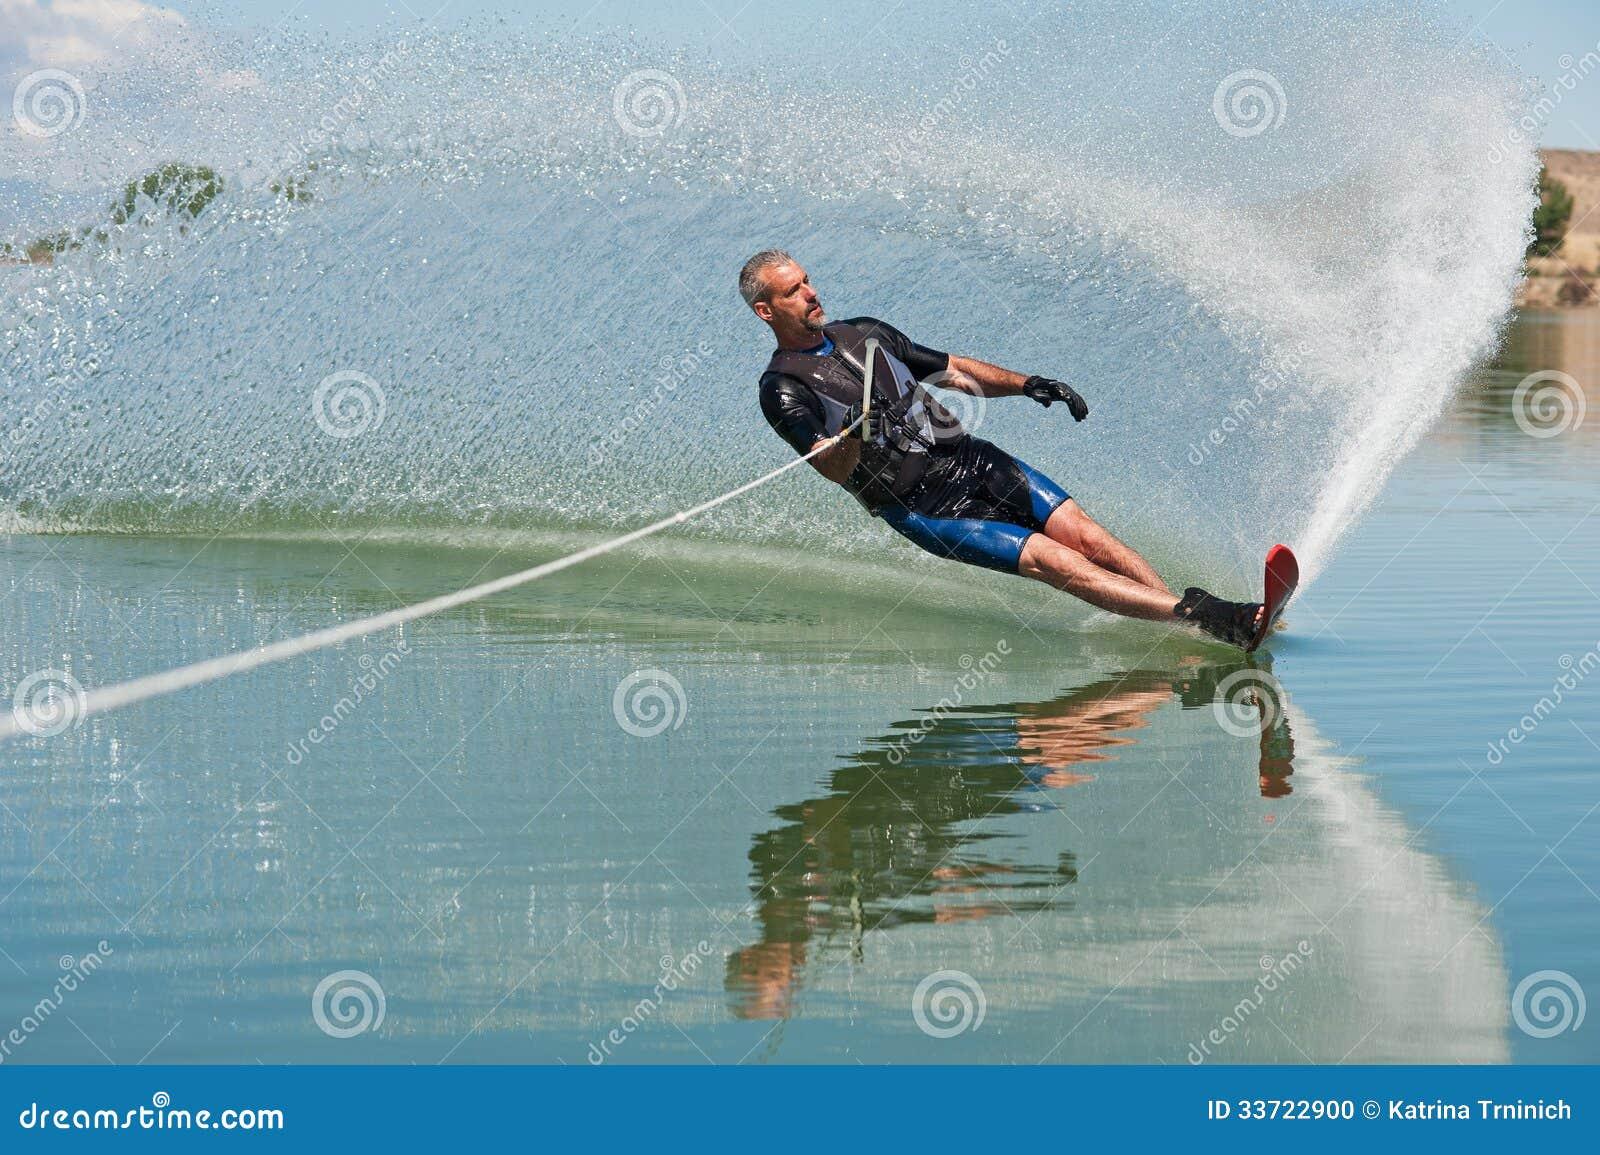 Mature Man Slalom Water Skiing Stock Photo Image 33722900